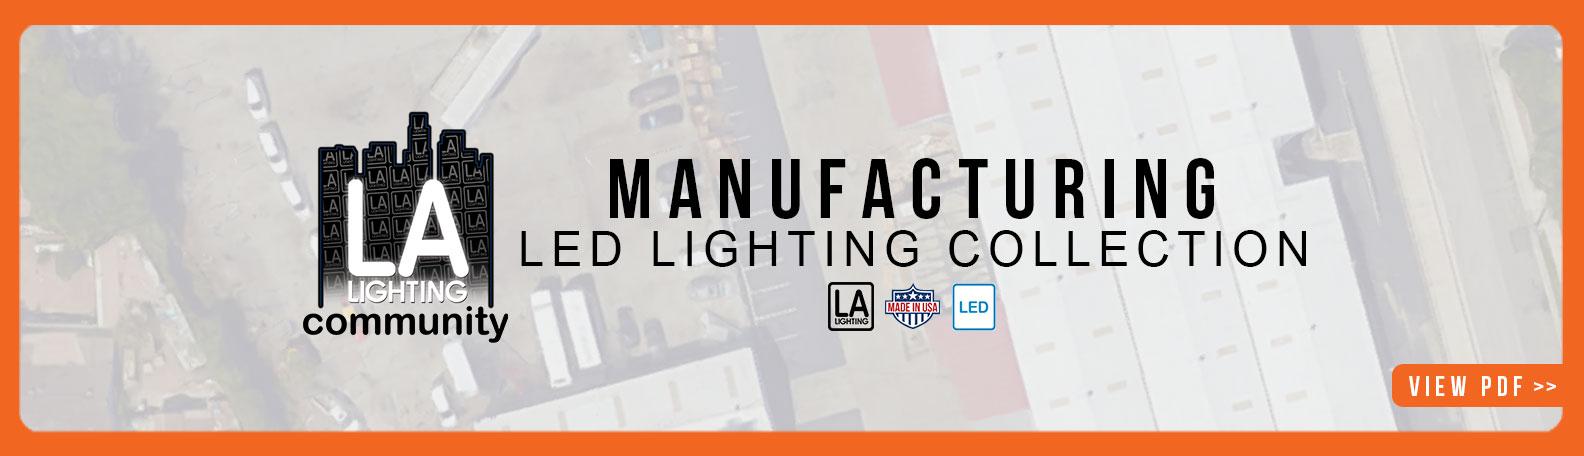 header_MAIN_manufacturing